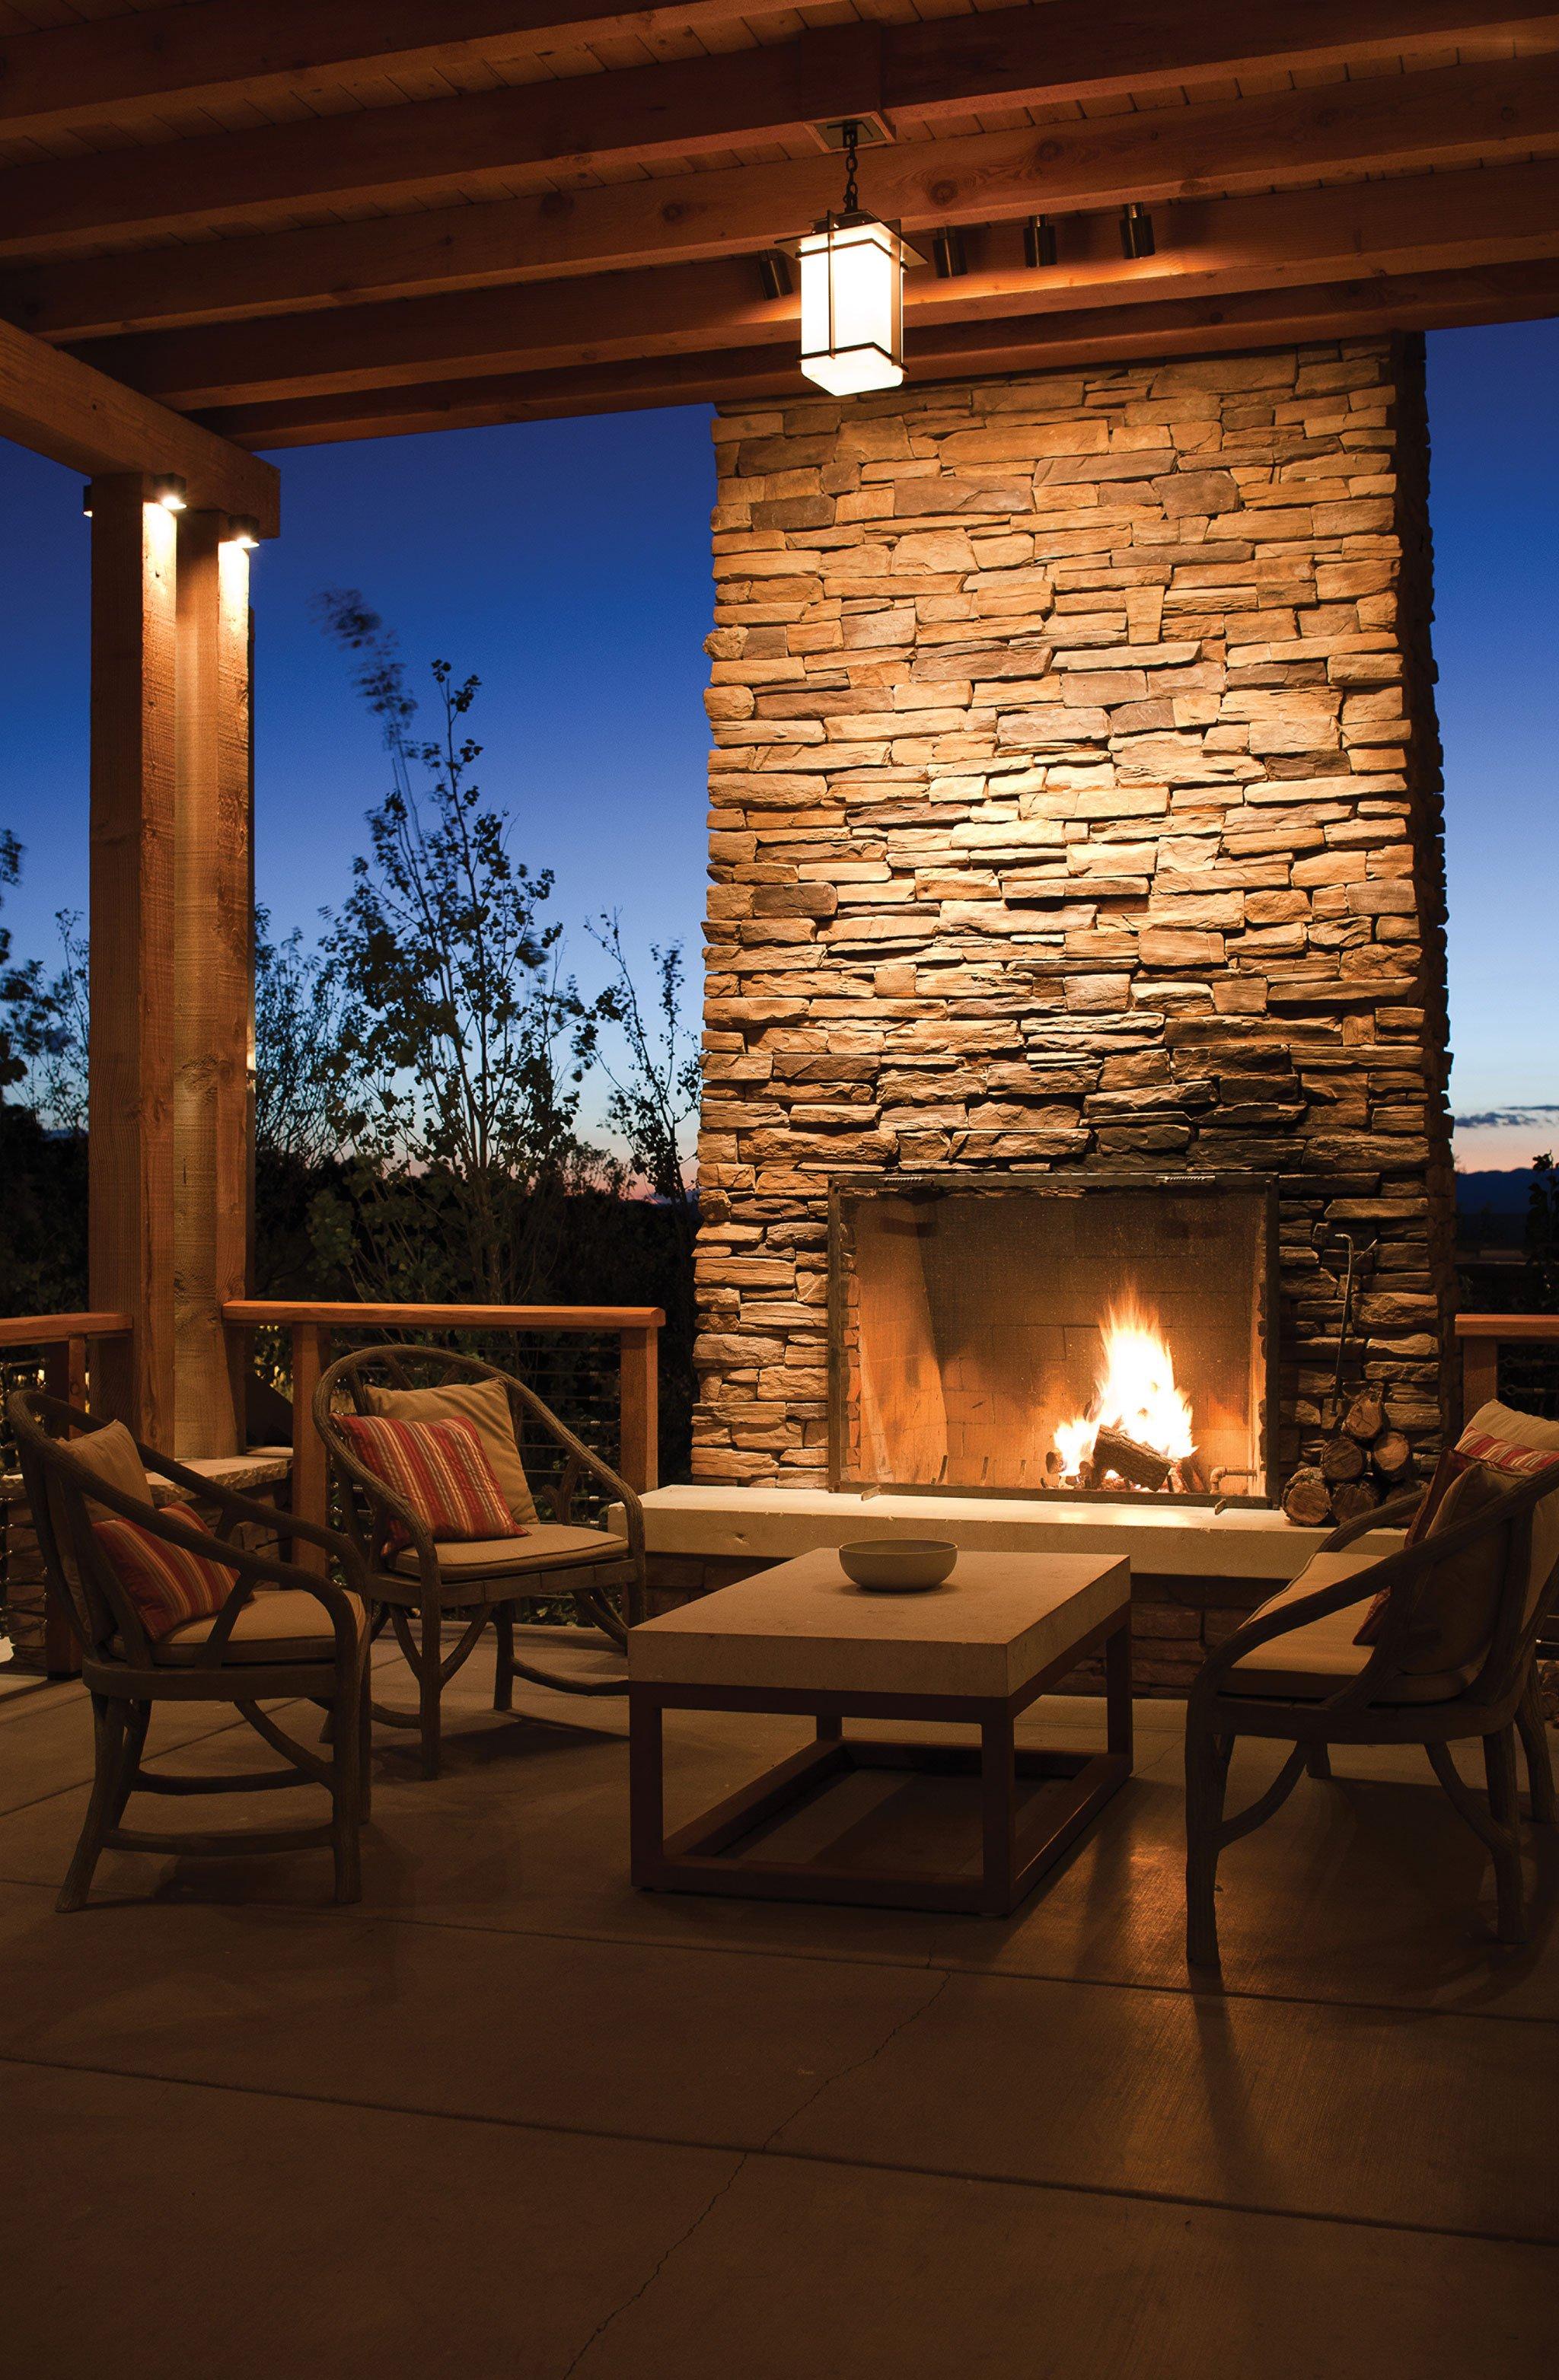 Canyon Equity - Four Seasons Rancho Encantado